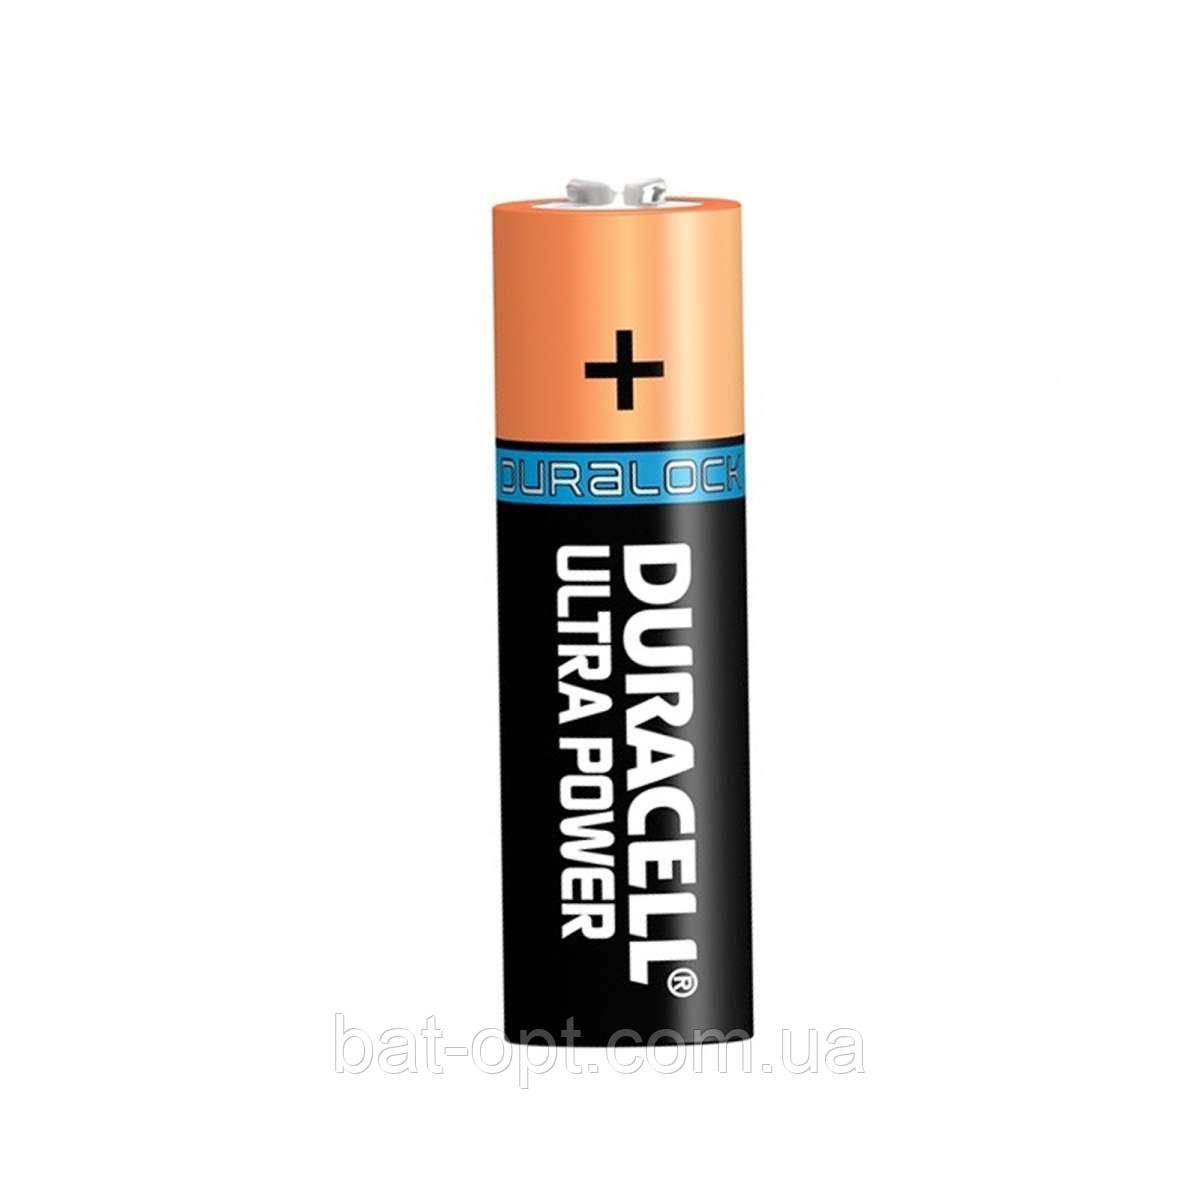 Батарейка щелочная Duracell Ultra Alkaline LR6 AA с индикатором заряда Powercheck пальчиковая